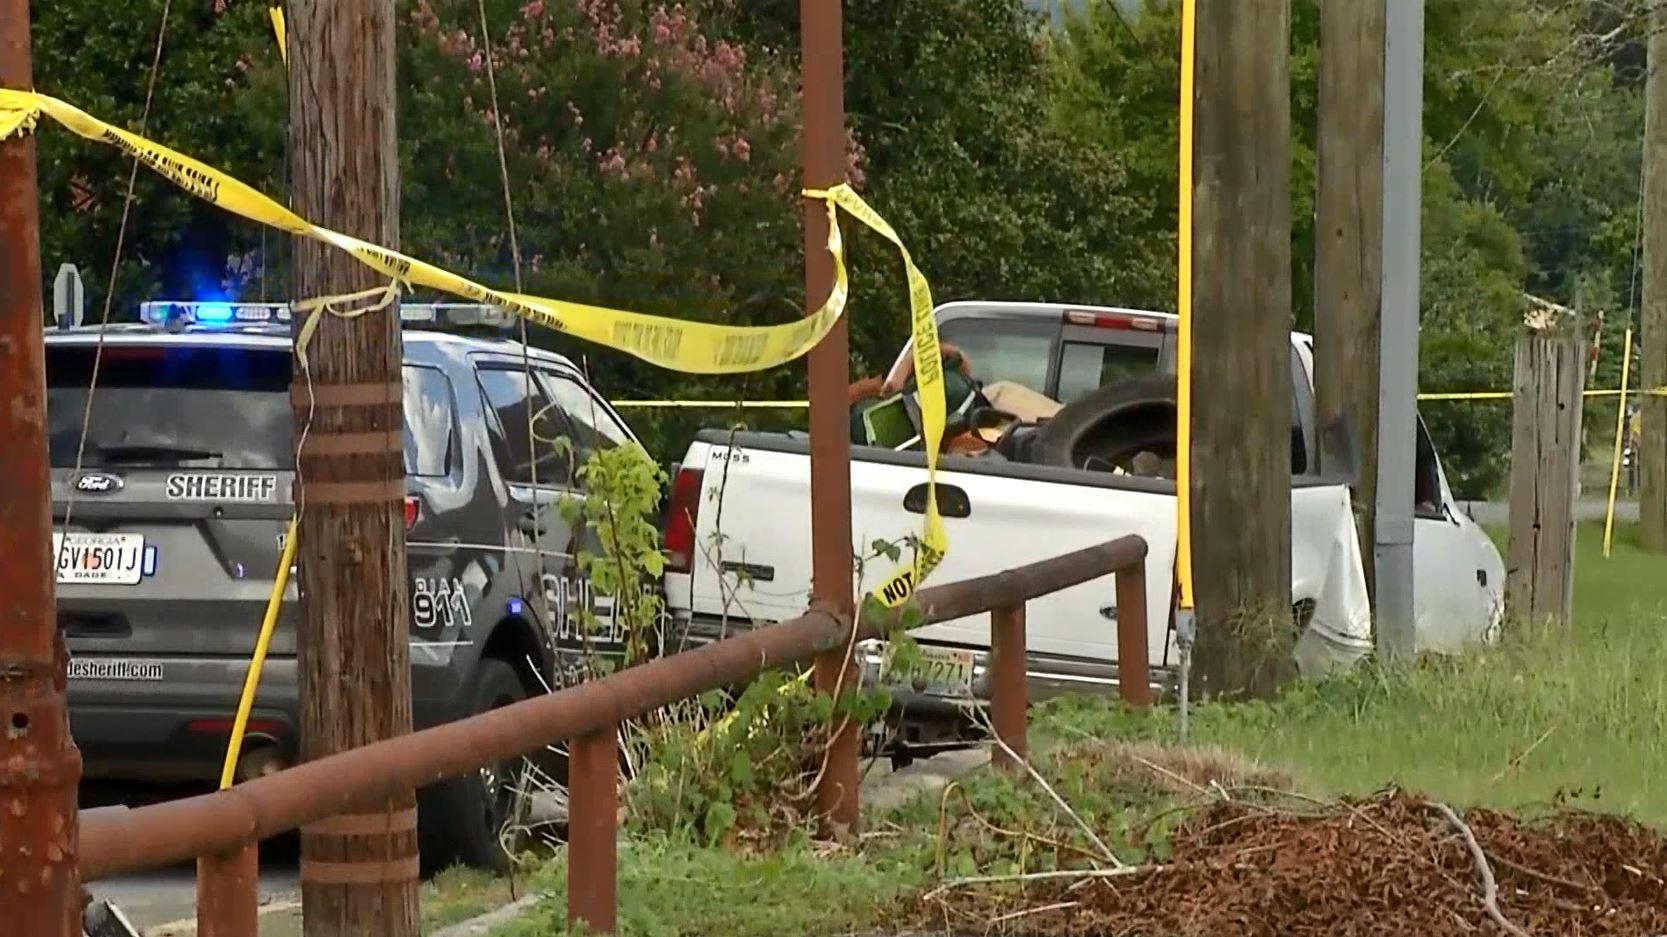 Georgia deputy critically injured in high-speed chase